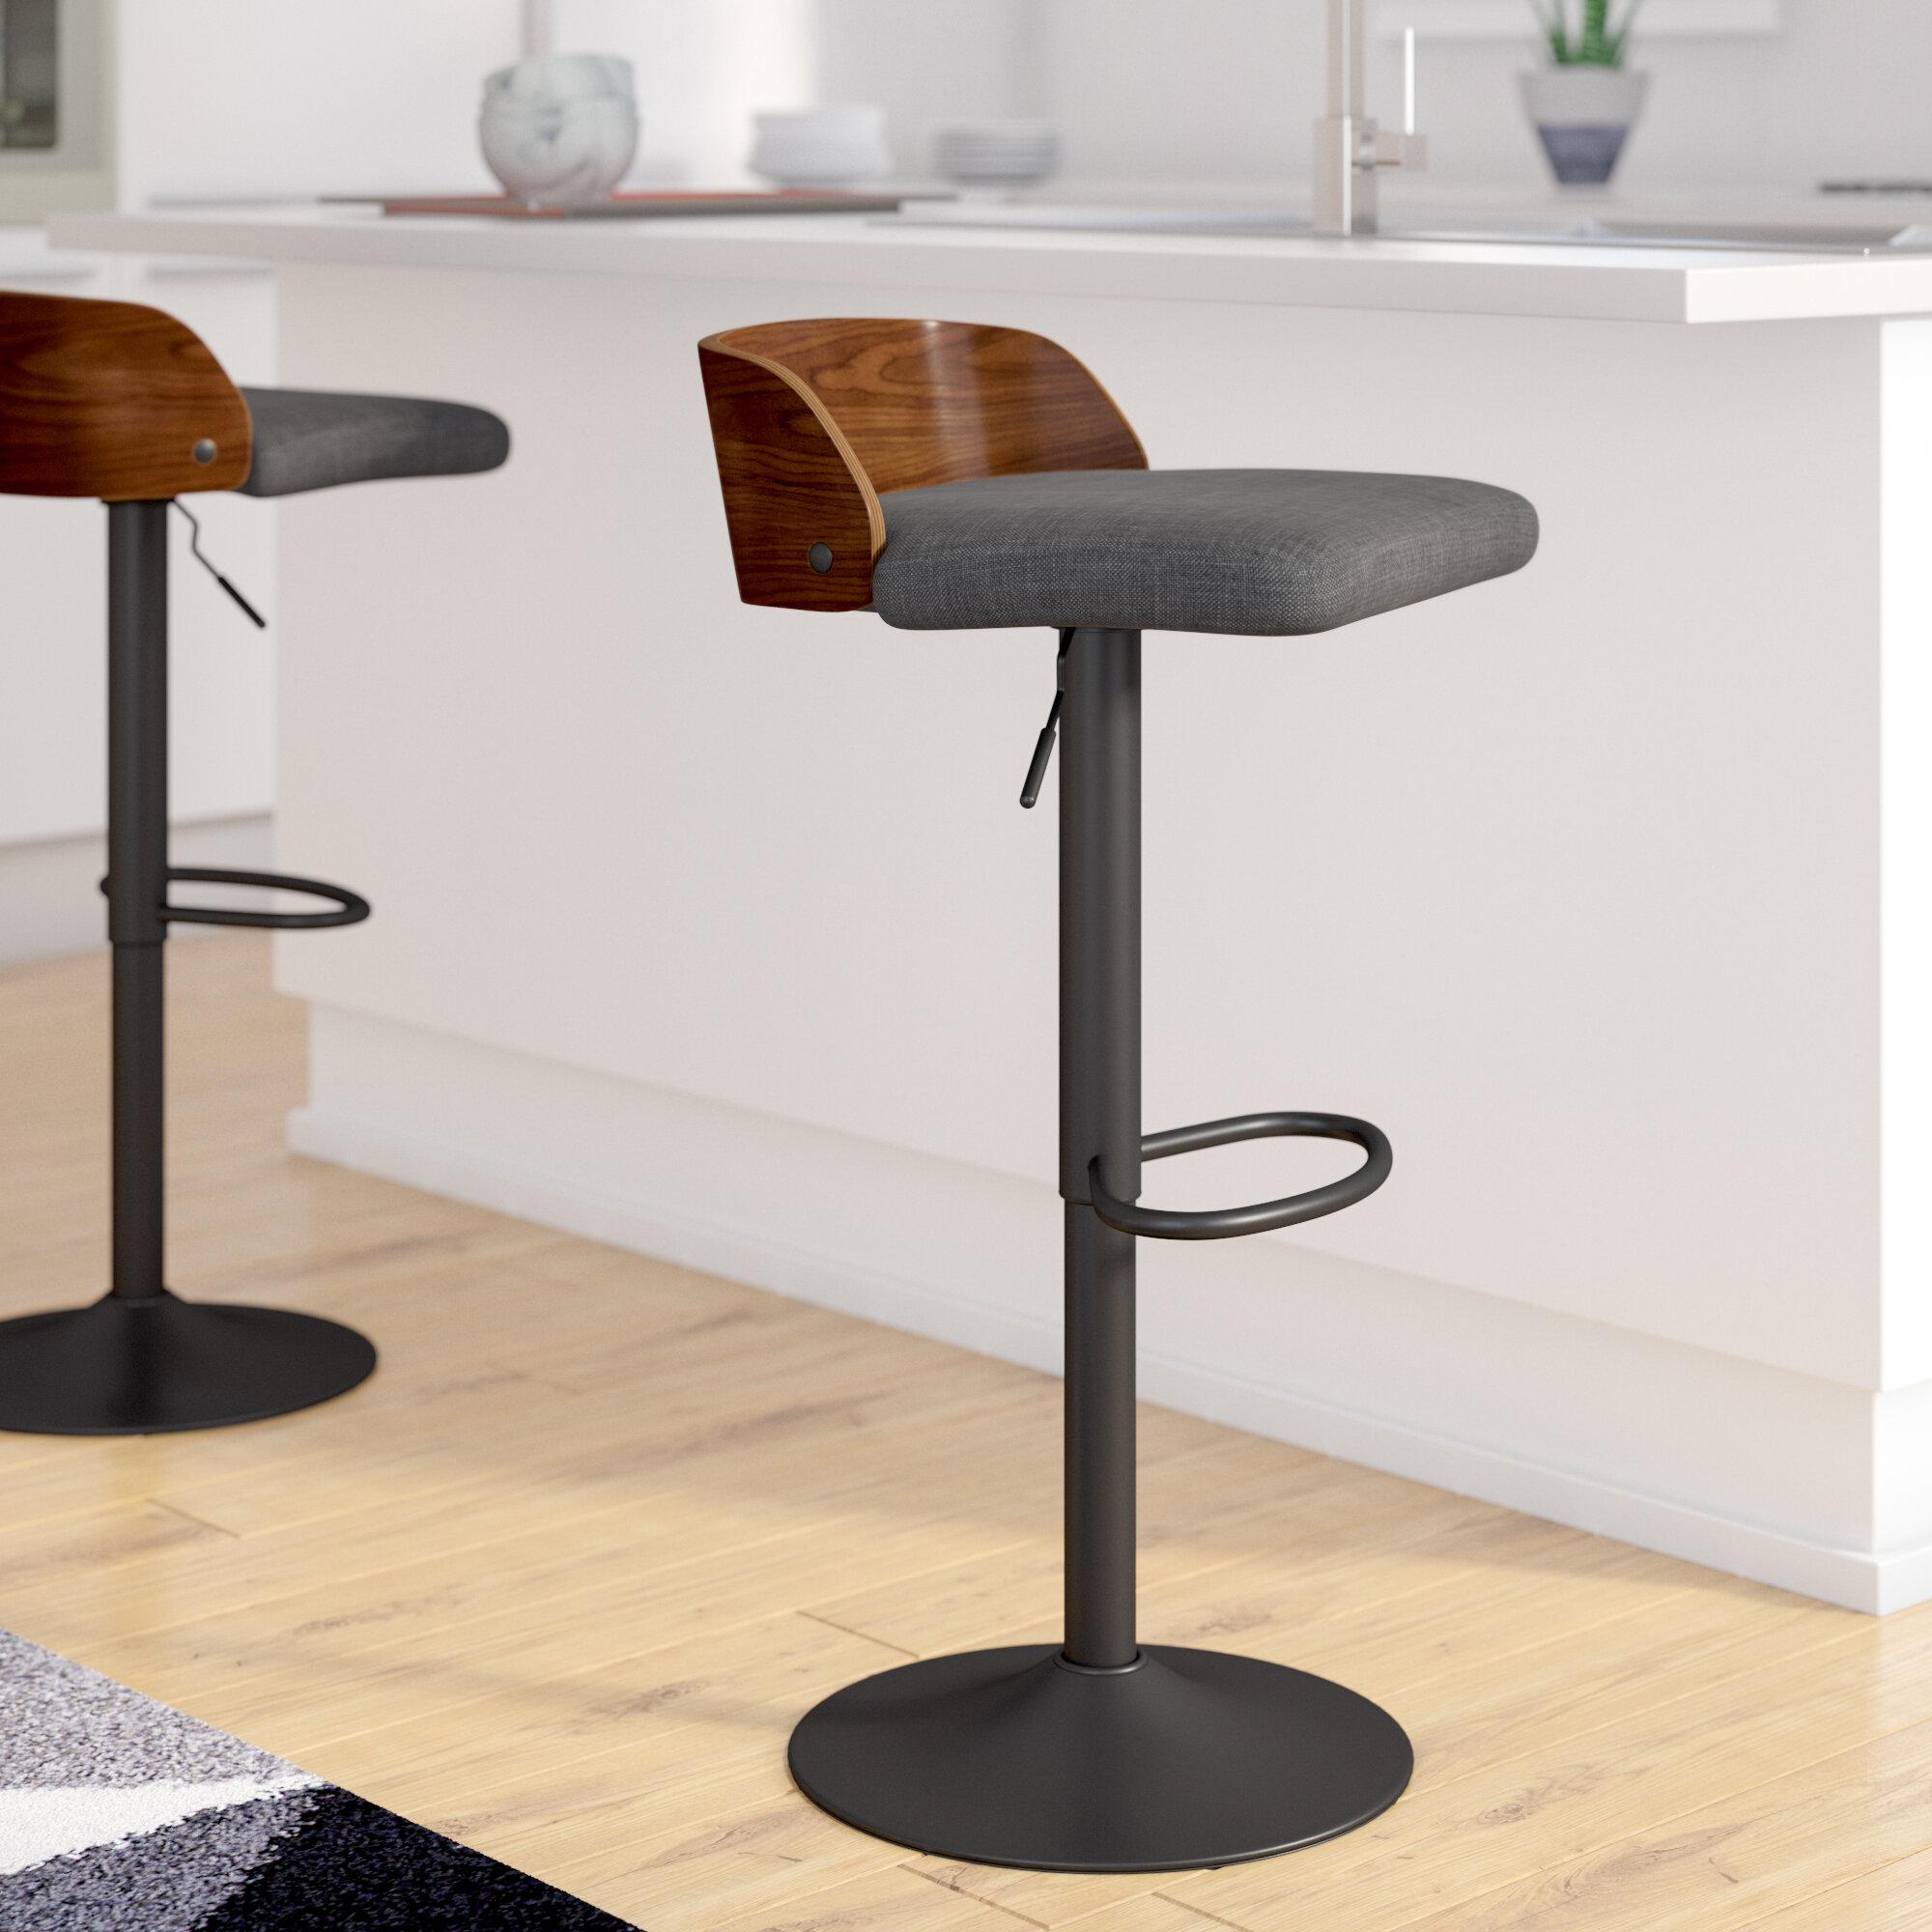 Marvelous Rockaway Adjustable Height Swivel Bar Stool Cjindustries Chair Design For Home Cjindustriesco